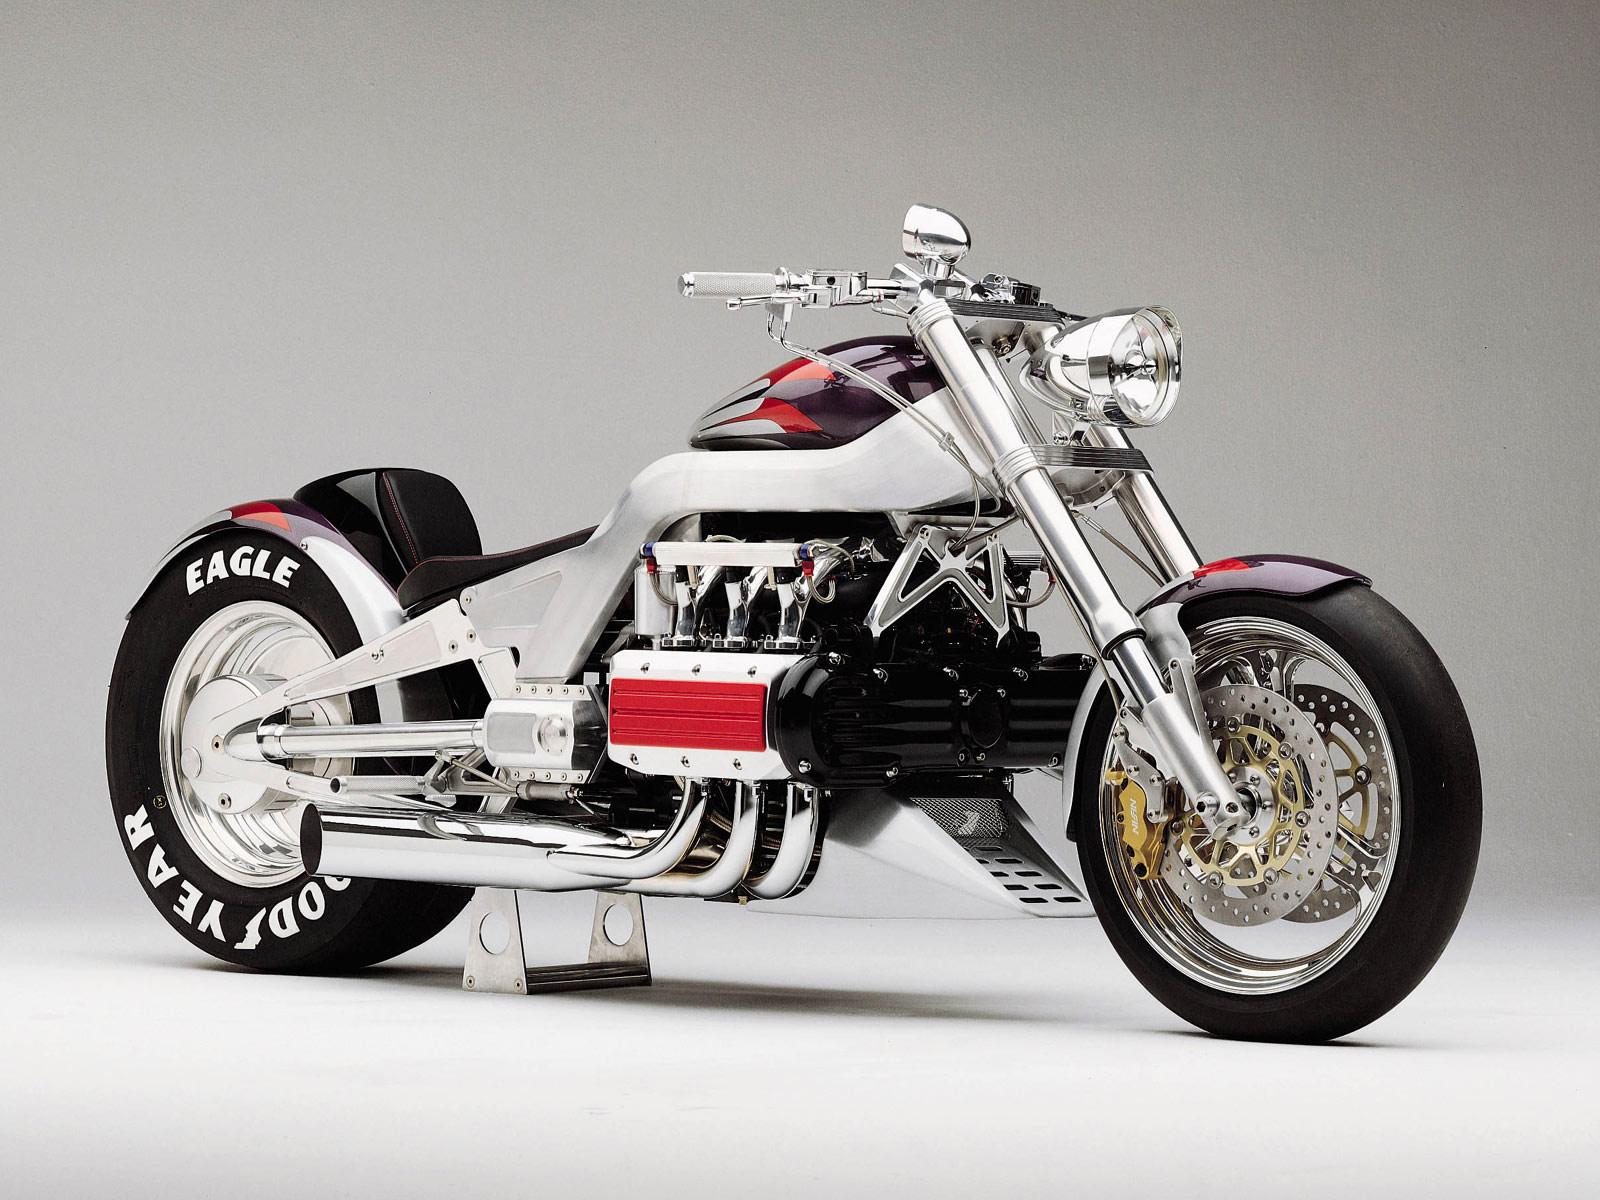 HONDA Wallpaper 2000 T4 Concept Motorcycle